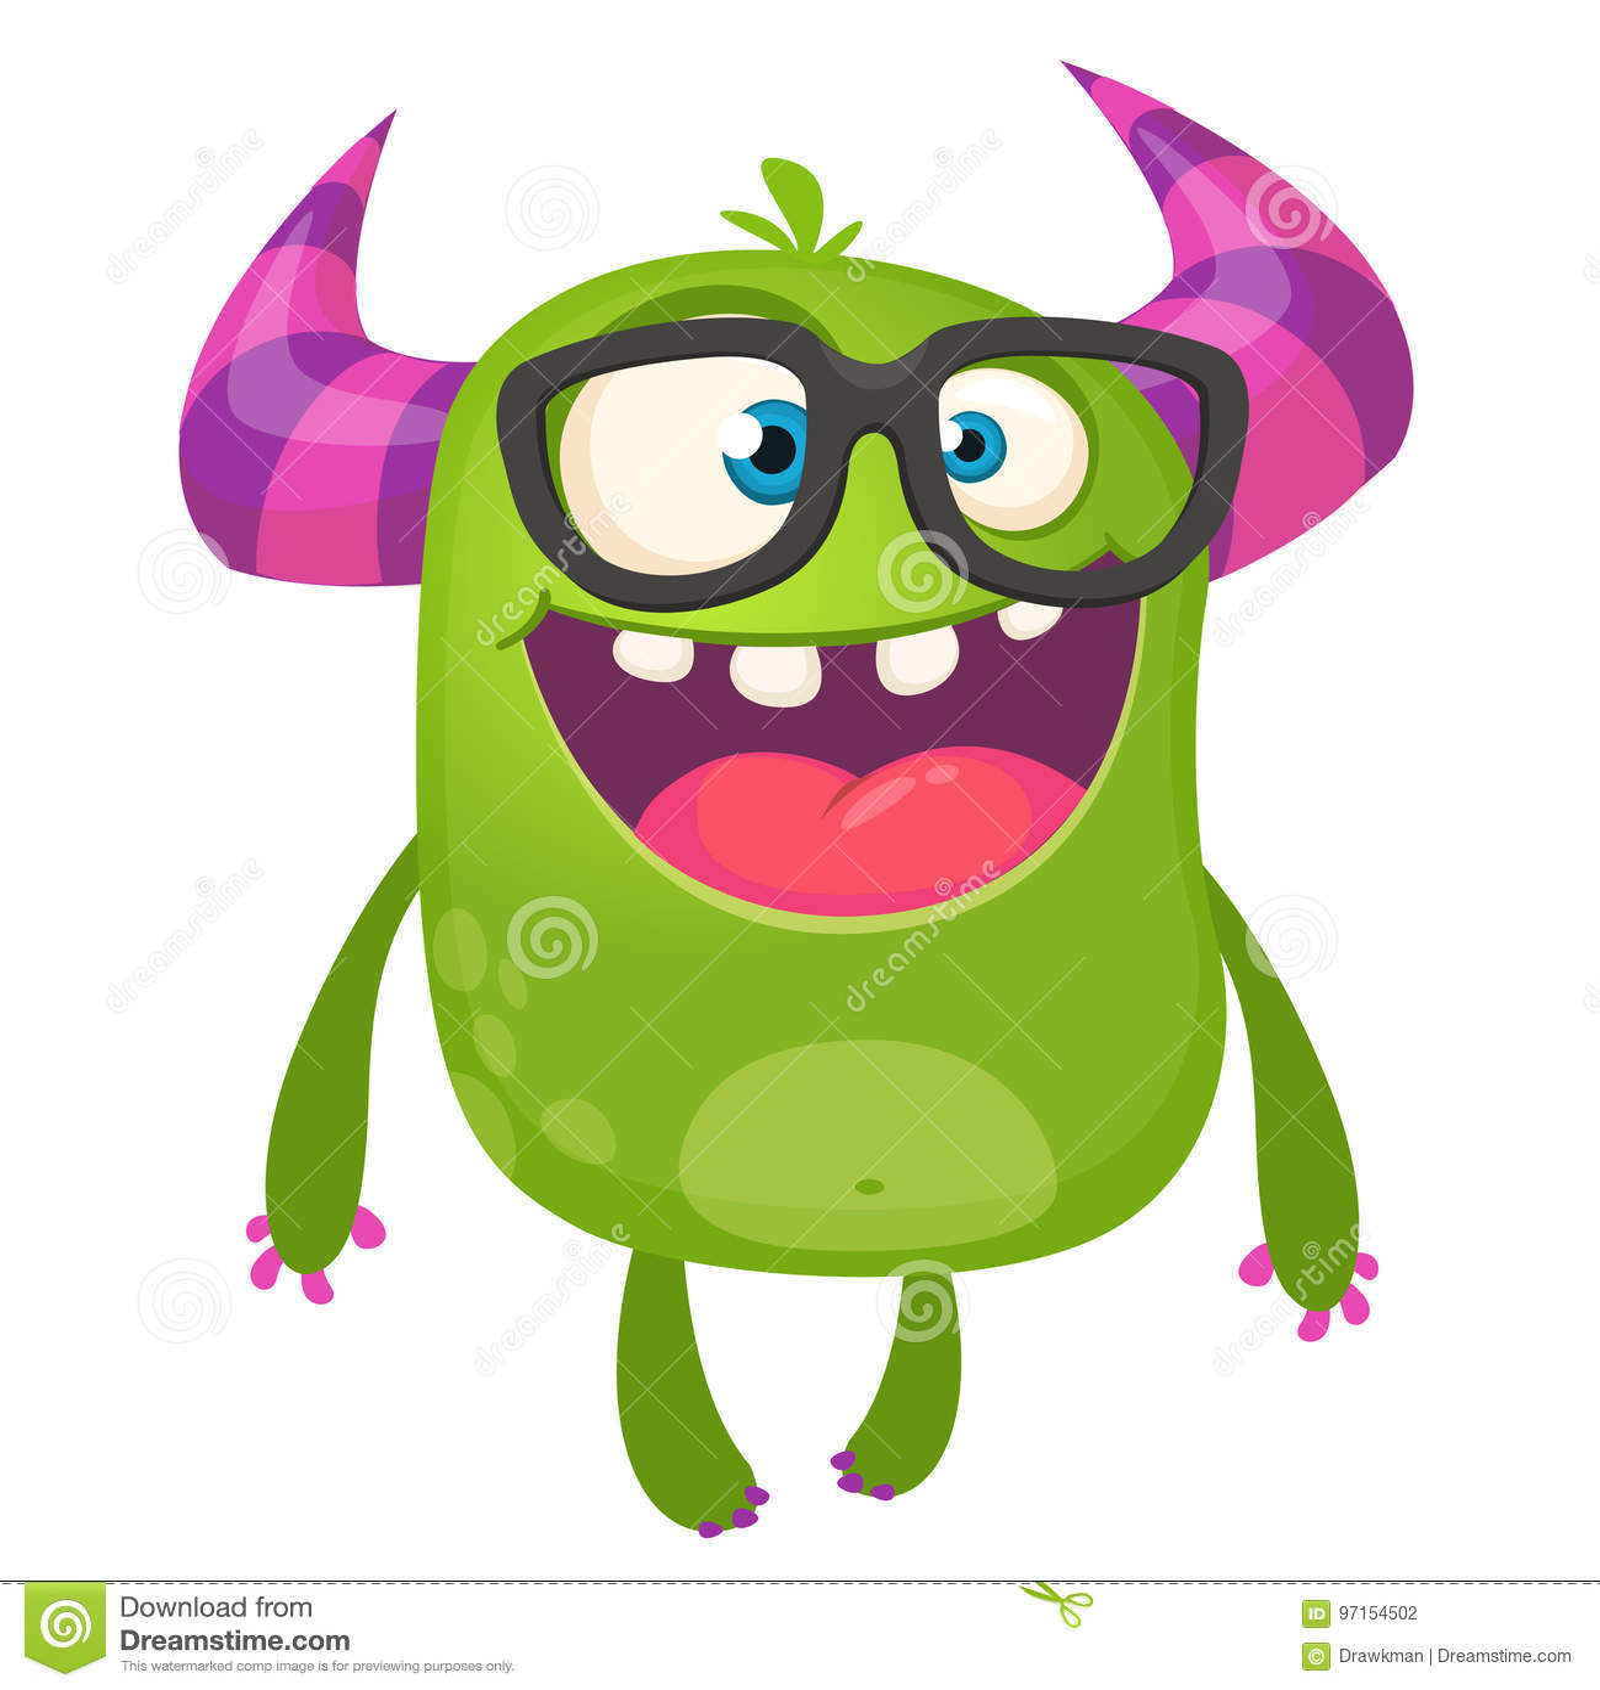 Download Cartoon Green Monster Nerd Wearing Glasses. Vector Illustration Isolated Stock Vector - Illustration of horned, isolate: 97154502